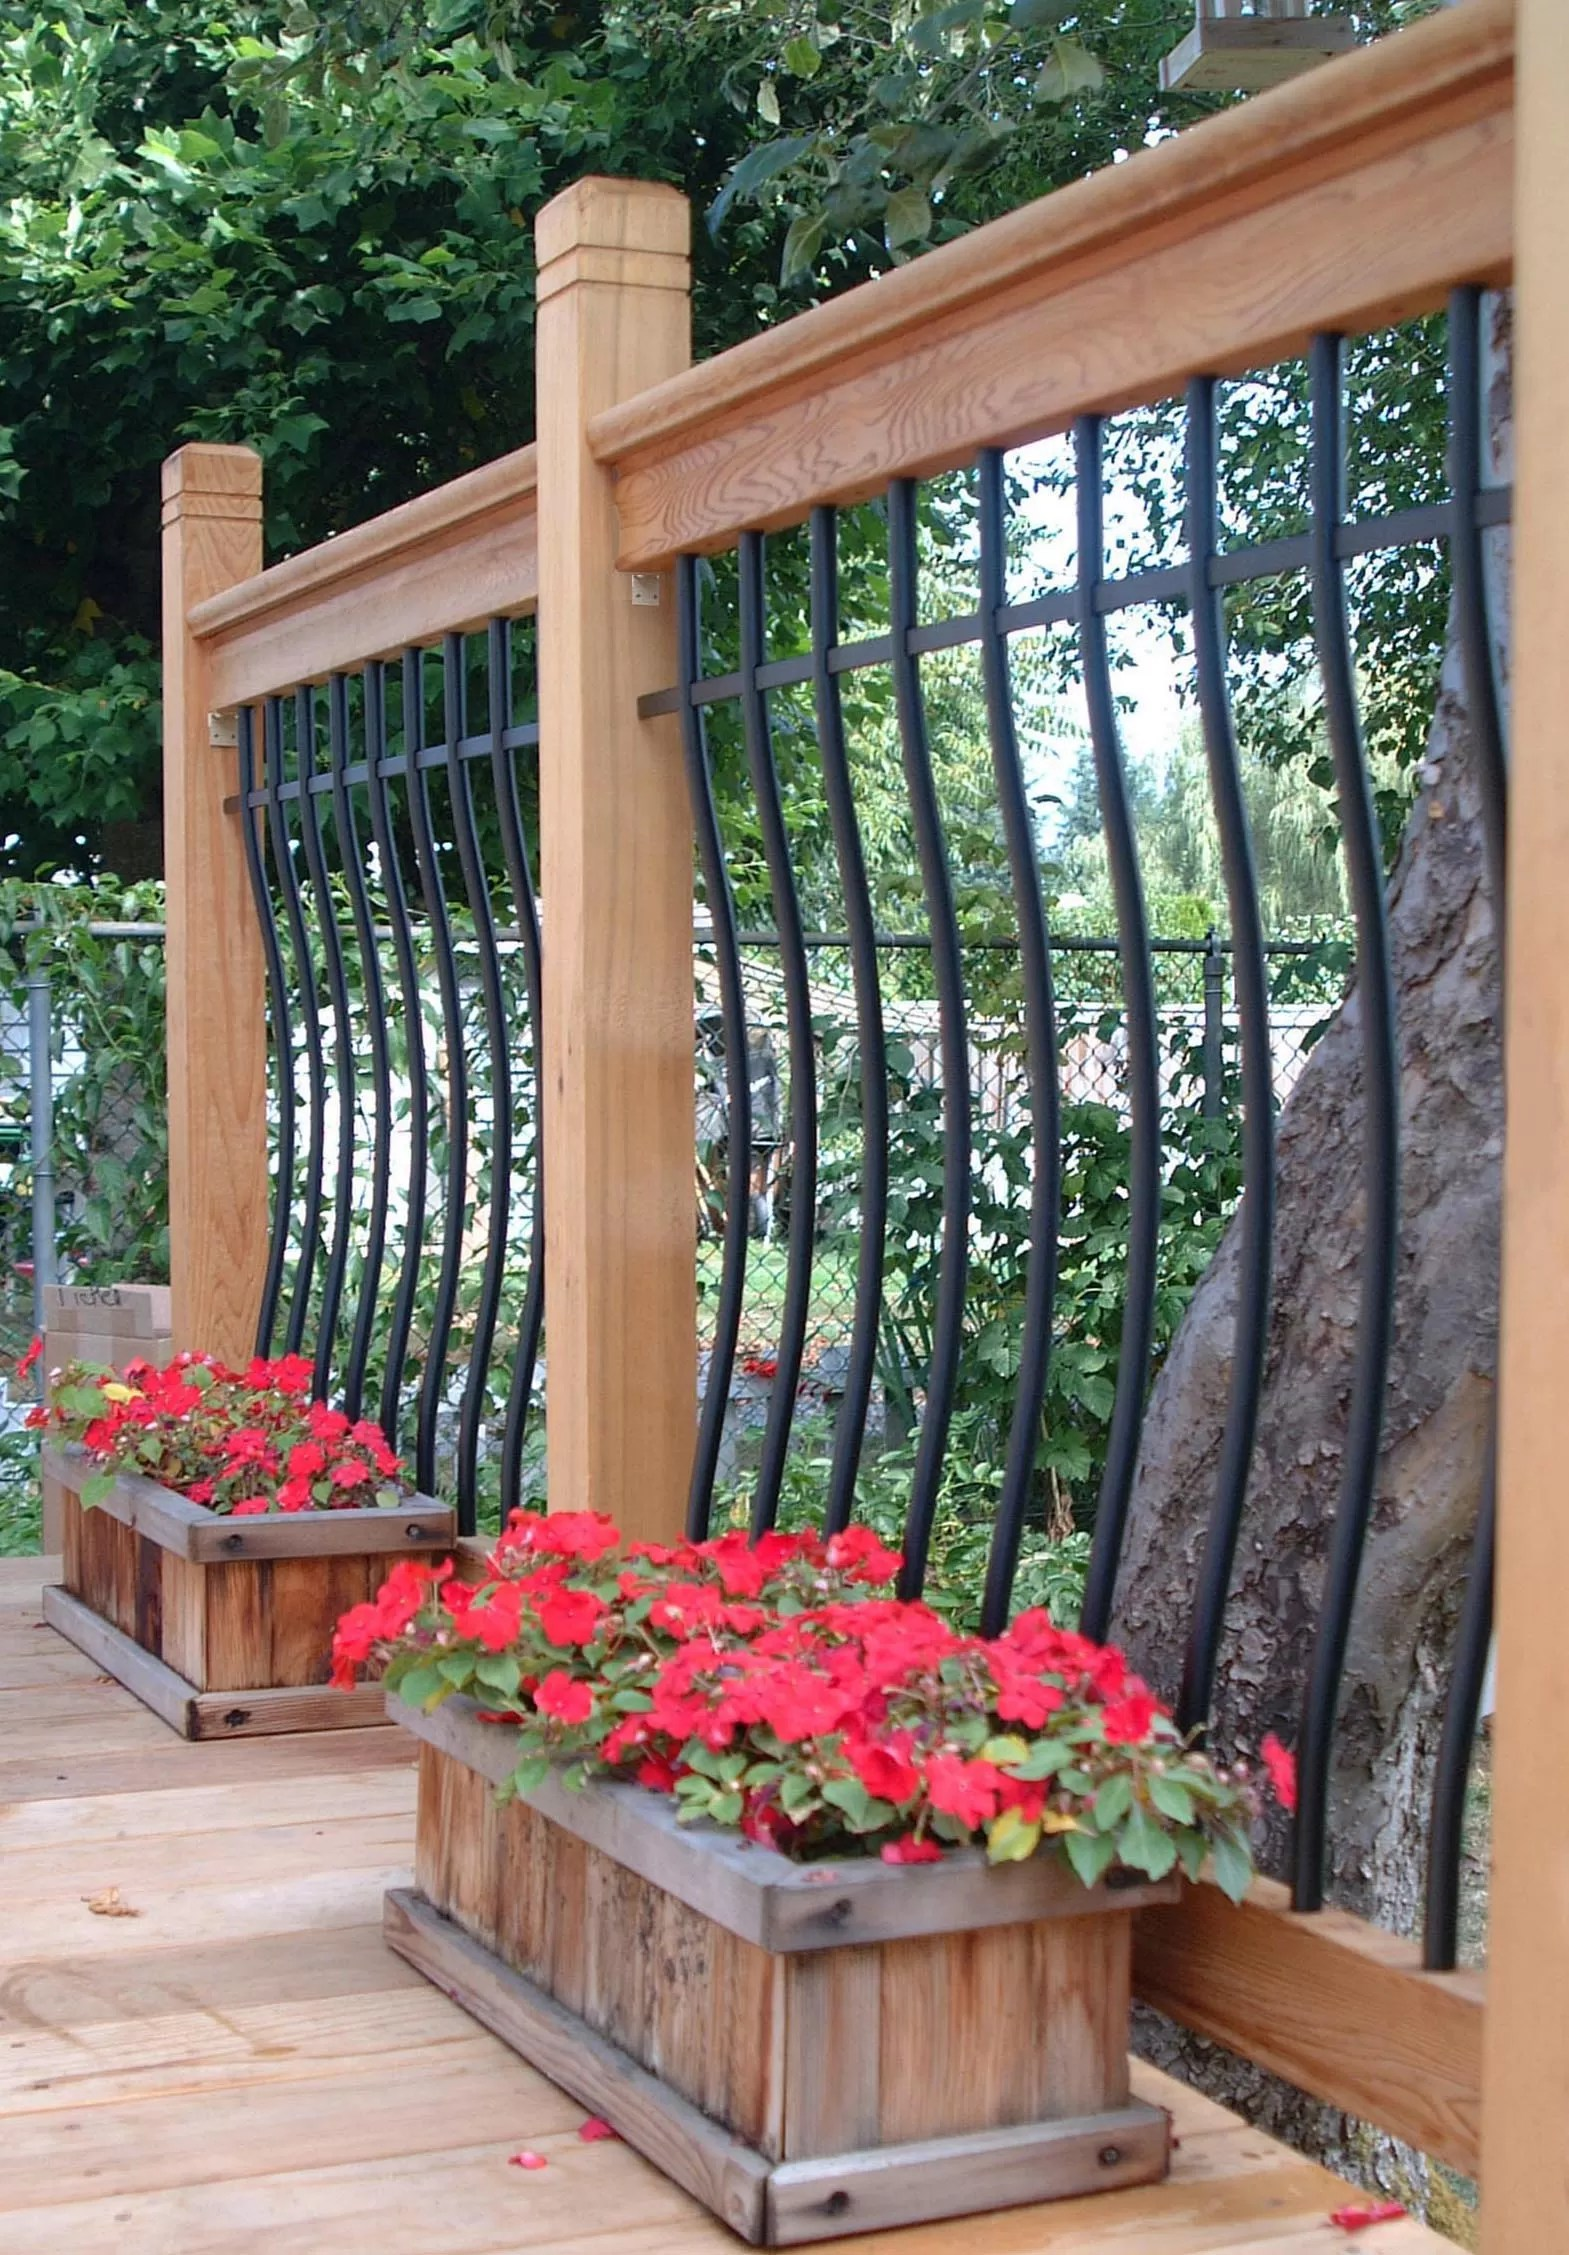 Deck Rail Planters